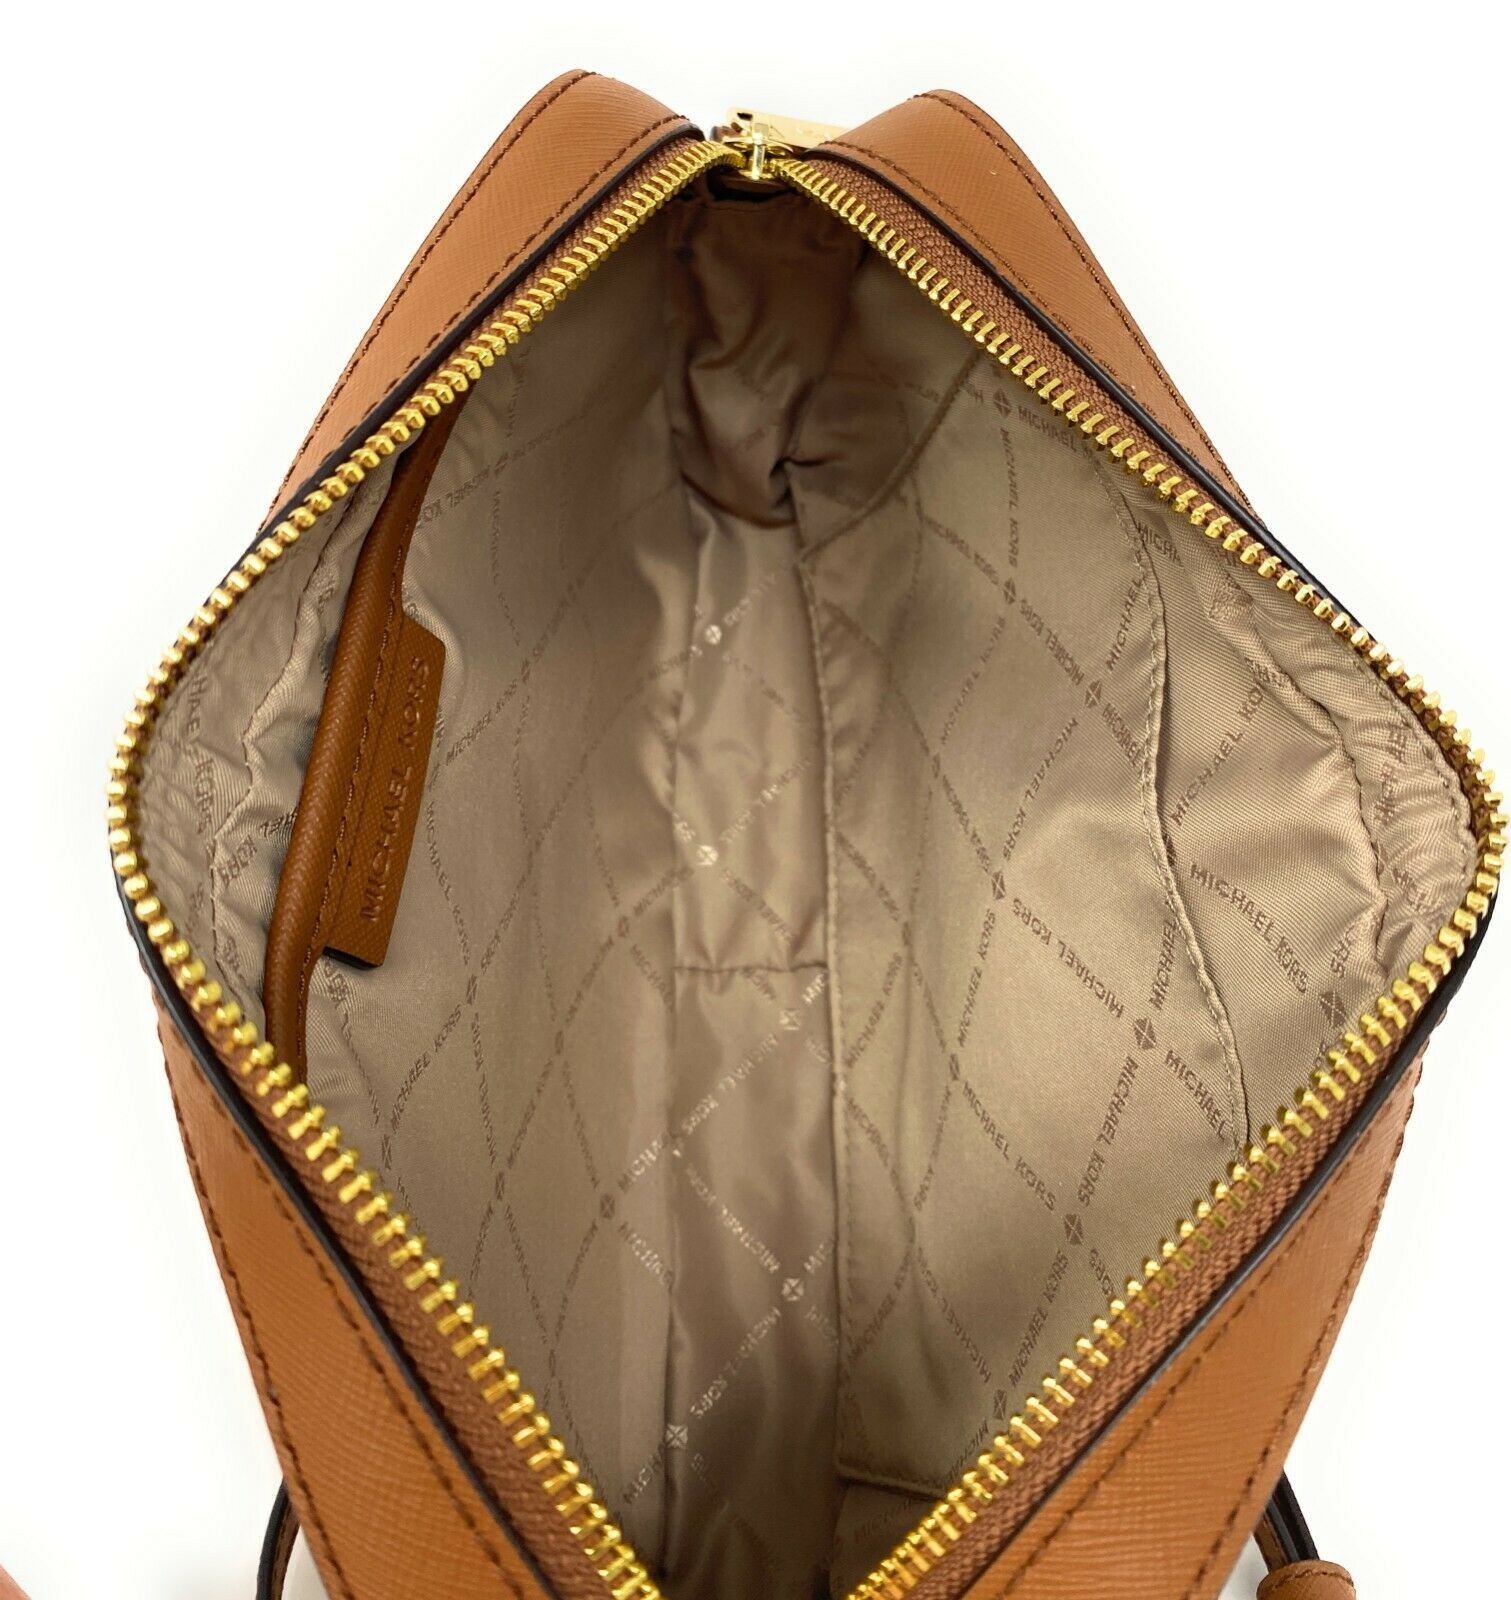 thumbnail 73 - Michael Kors Jet Set Item Large East West Crossbody Chain Handbag Clutch $298